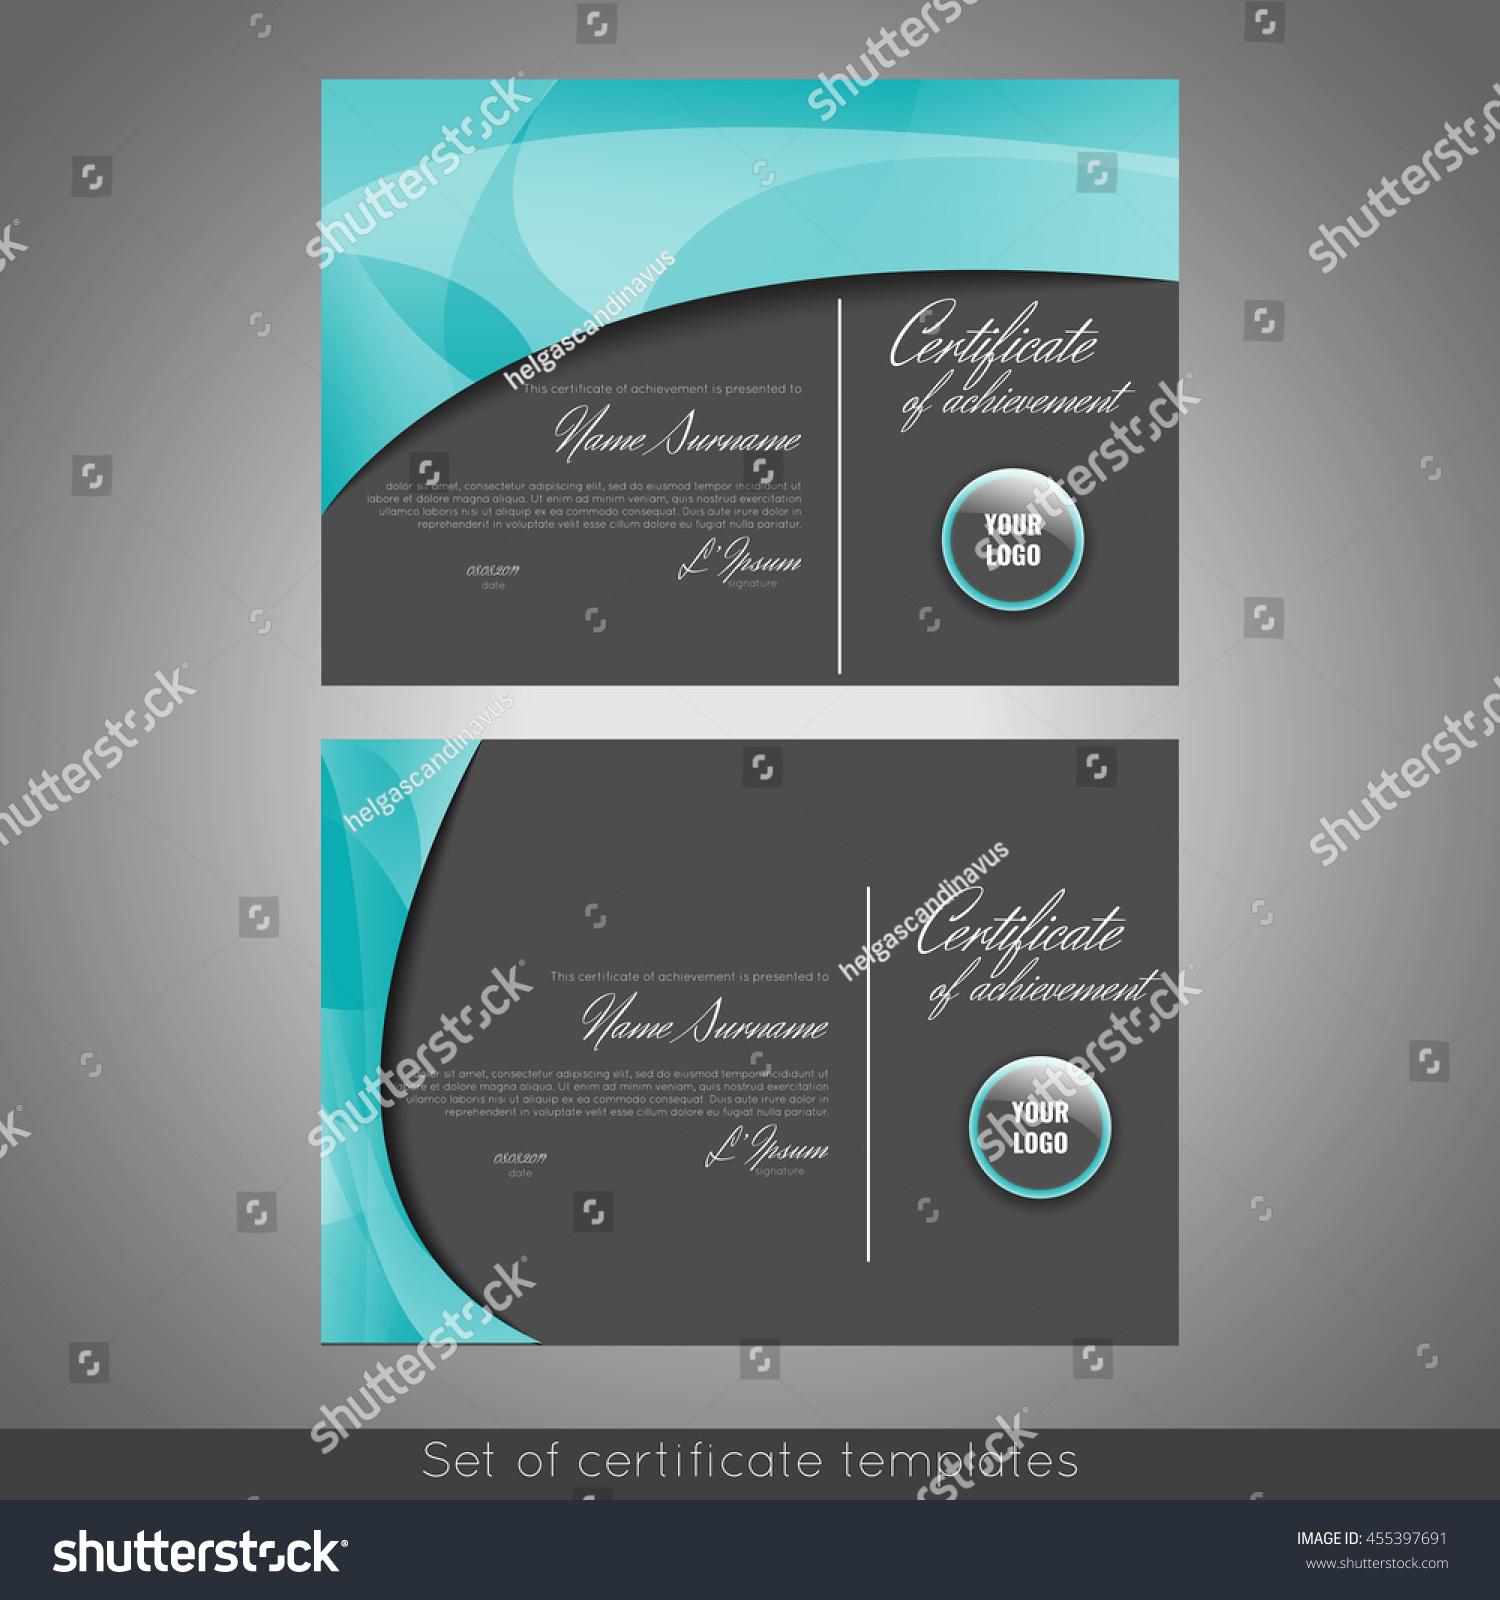 Set certificate templates appreciation completion achievement set of certificate templates appreciation completion achievement graduation diploma or award yadclub Choice Image